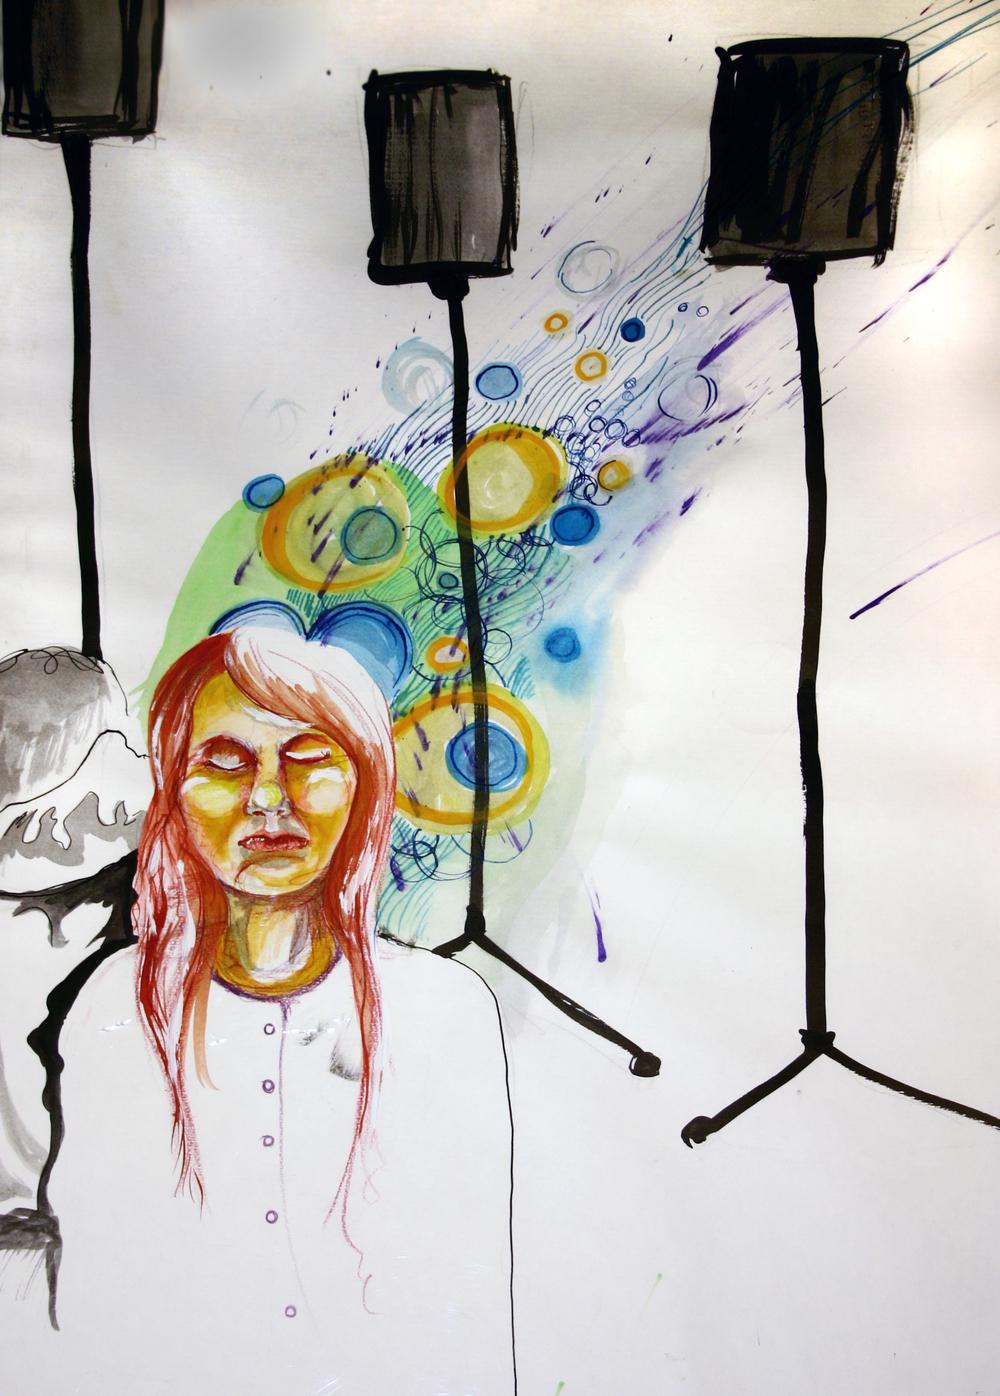 Paint - Girl with speakers.jpg